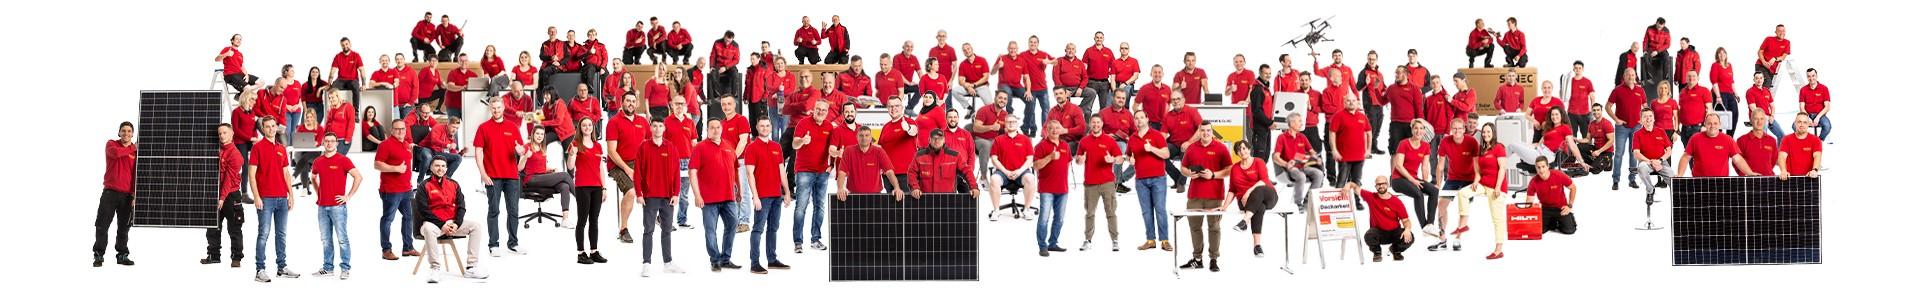 BSH GmbH & Co.KG